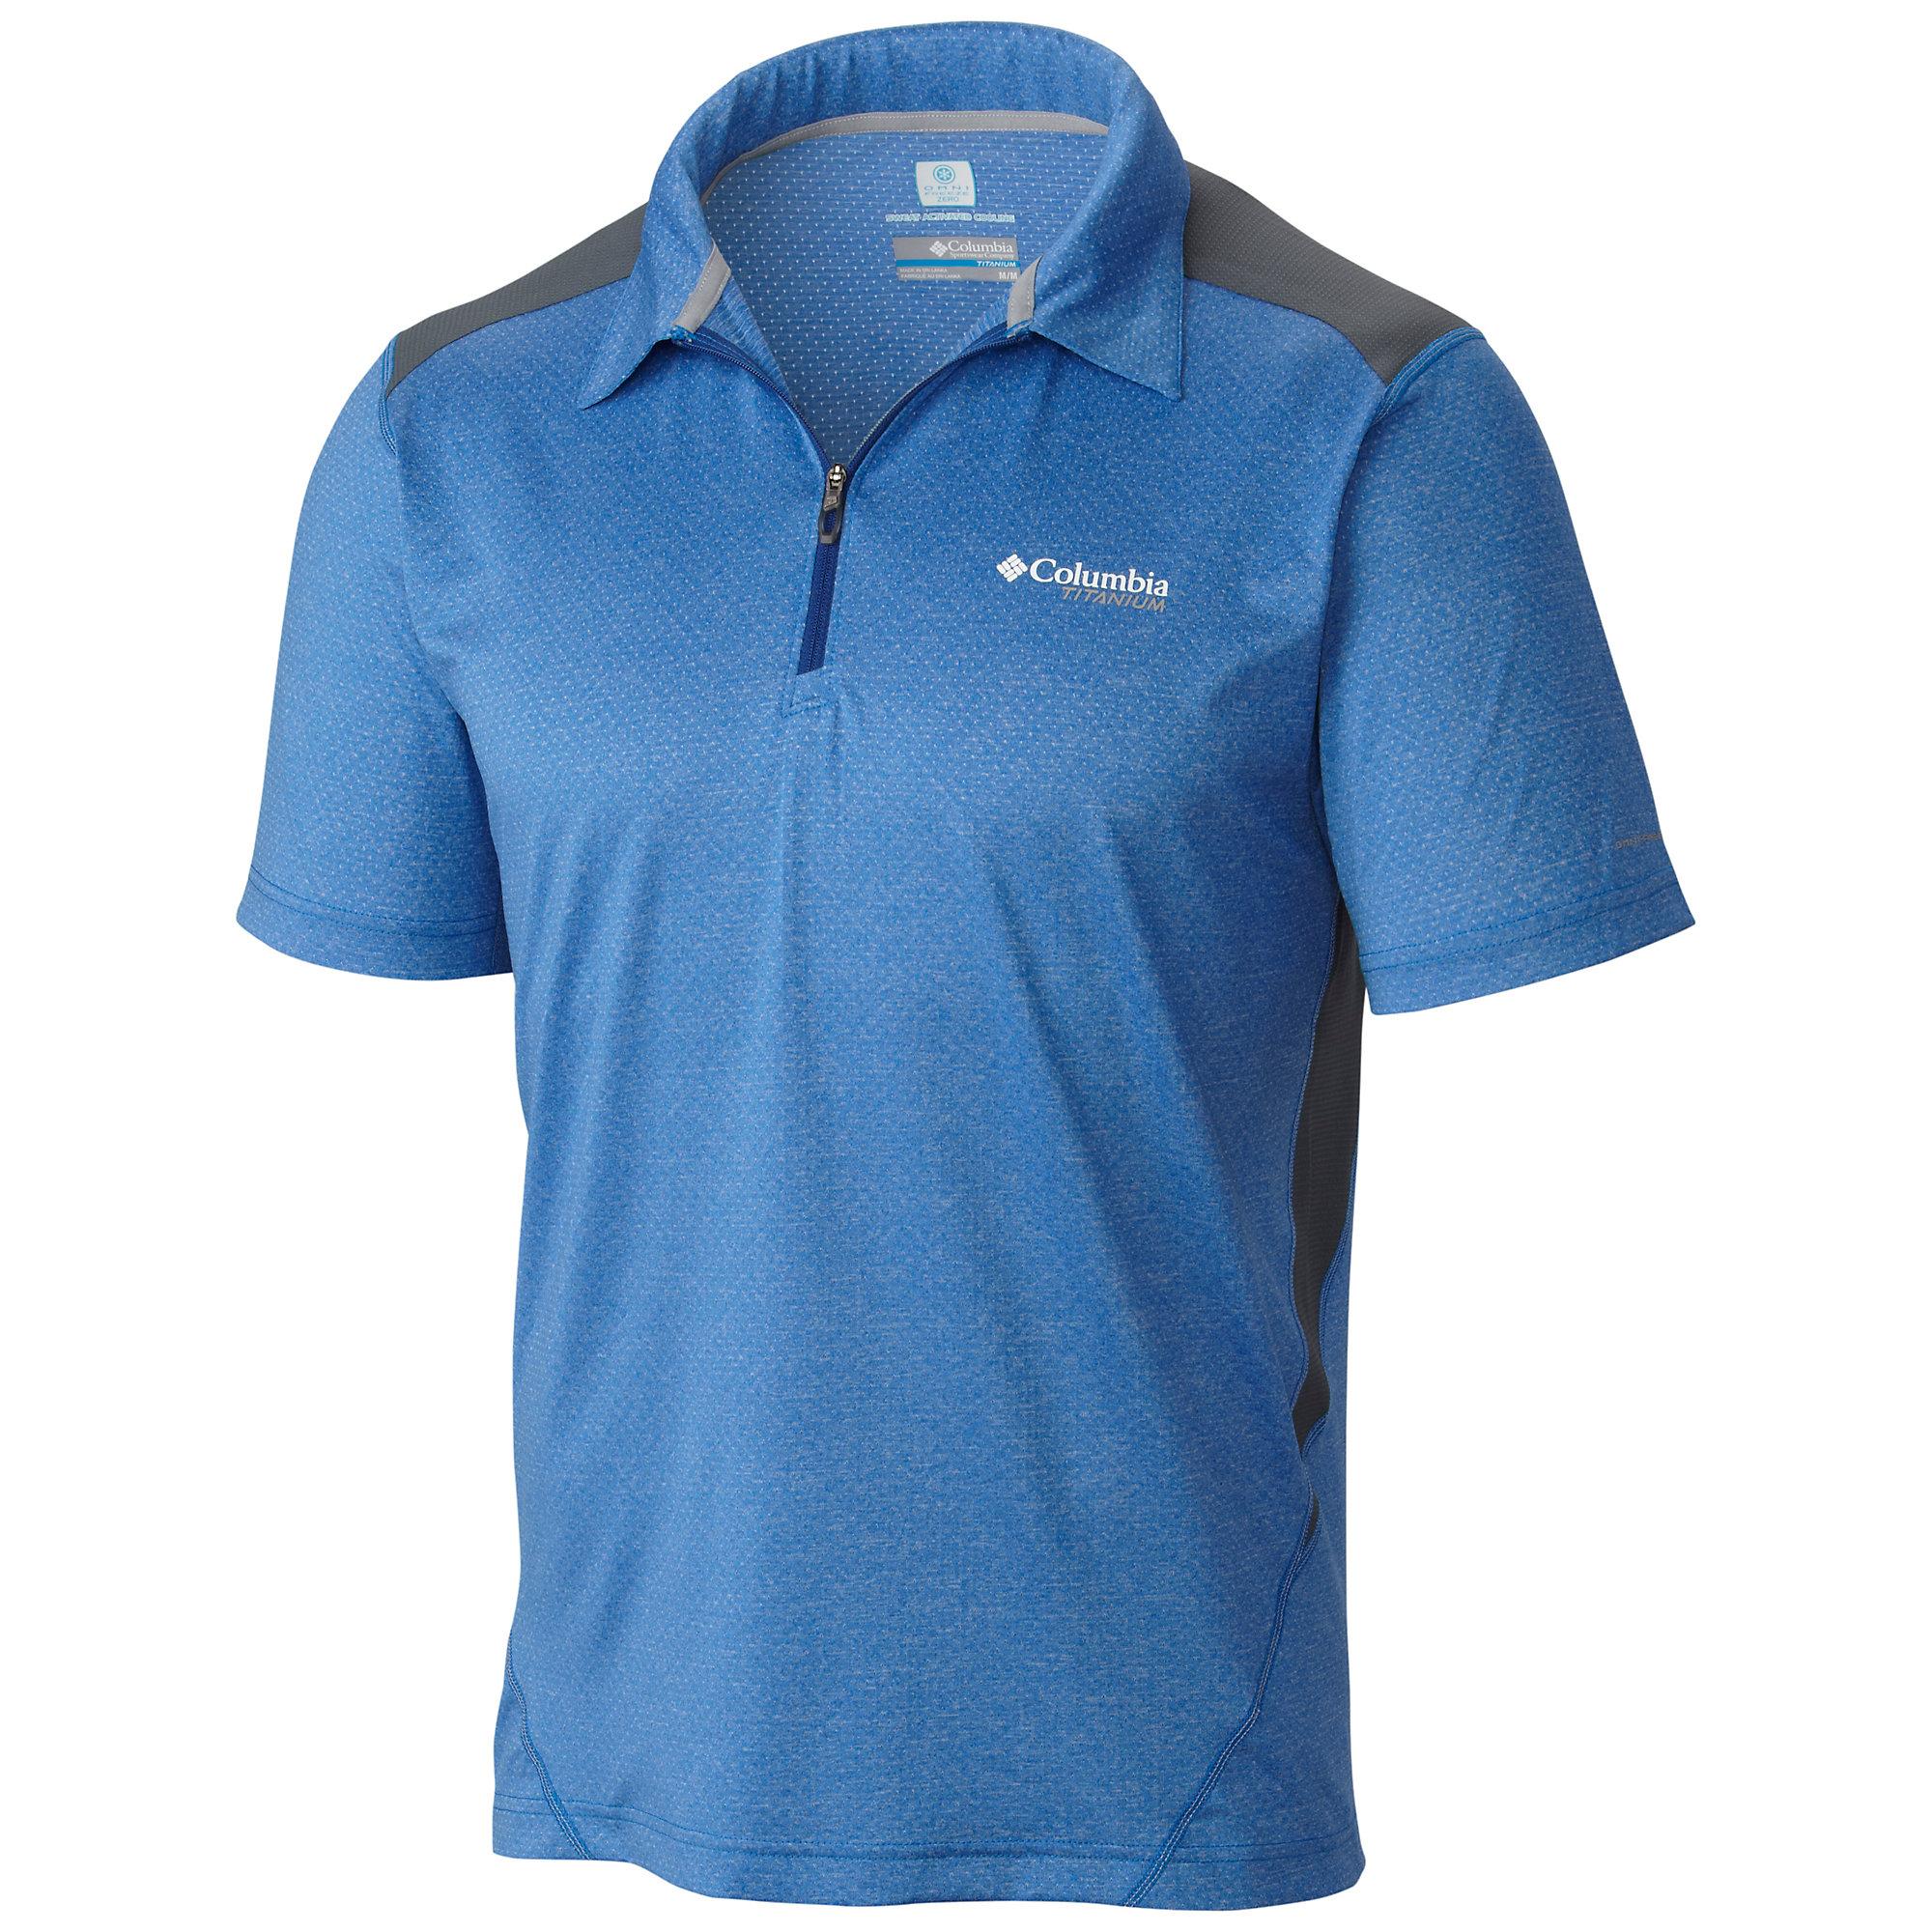 Columbia Titan Ice Zip Polo Shirt